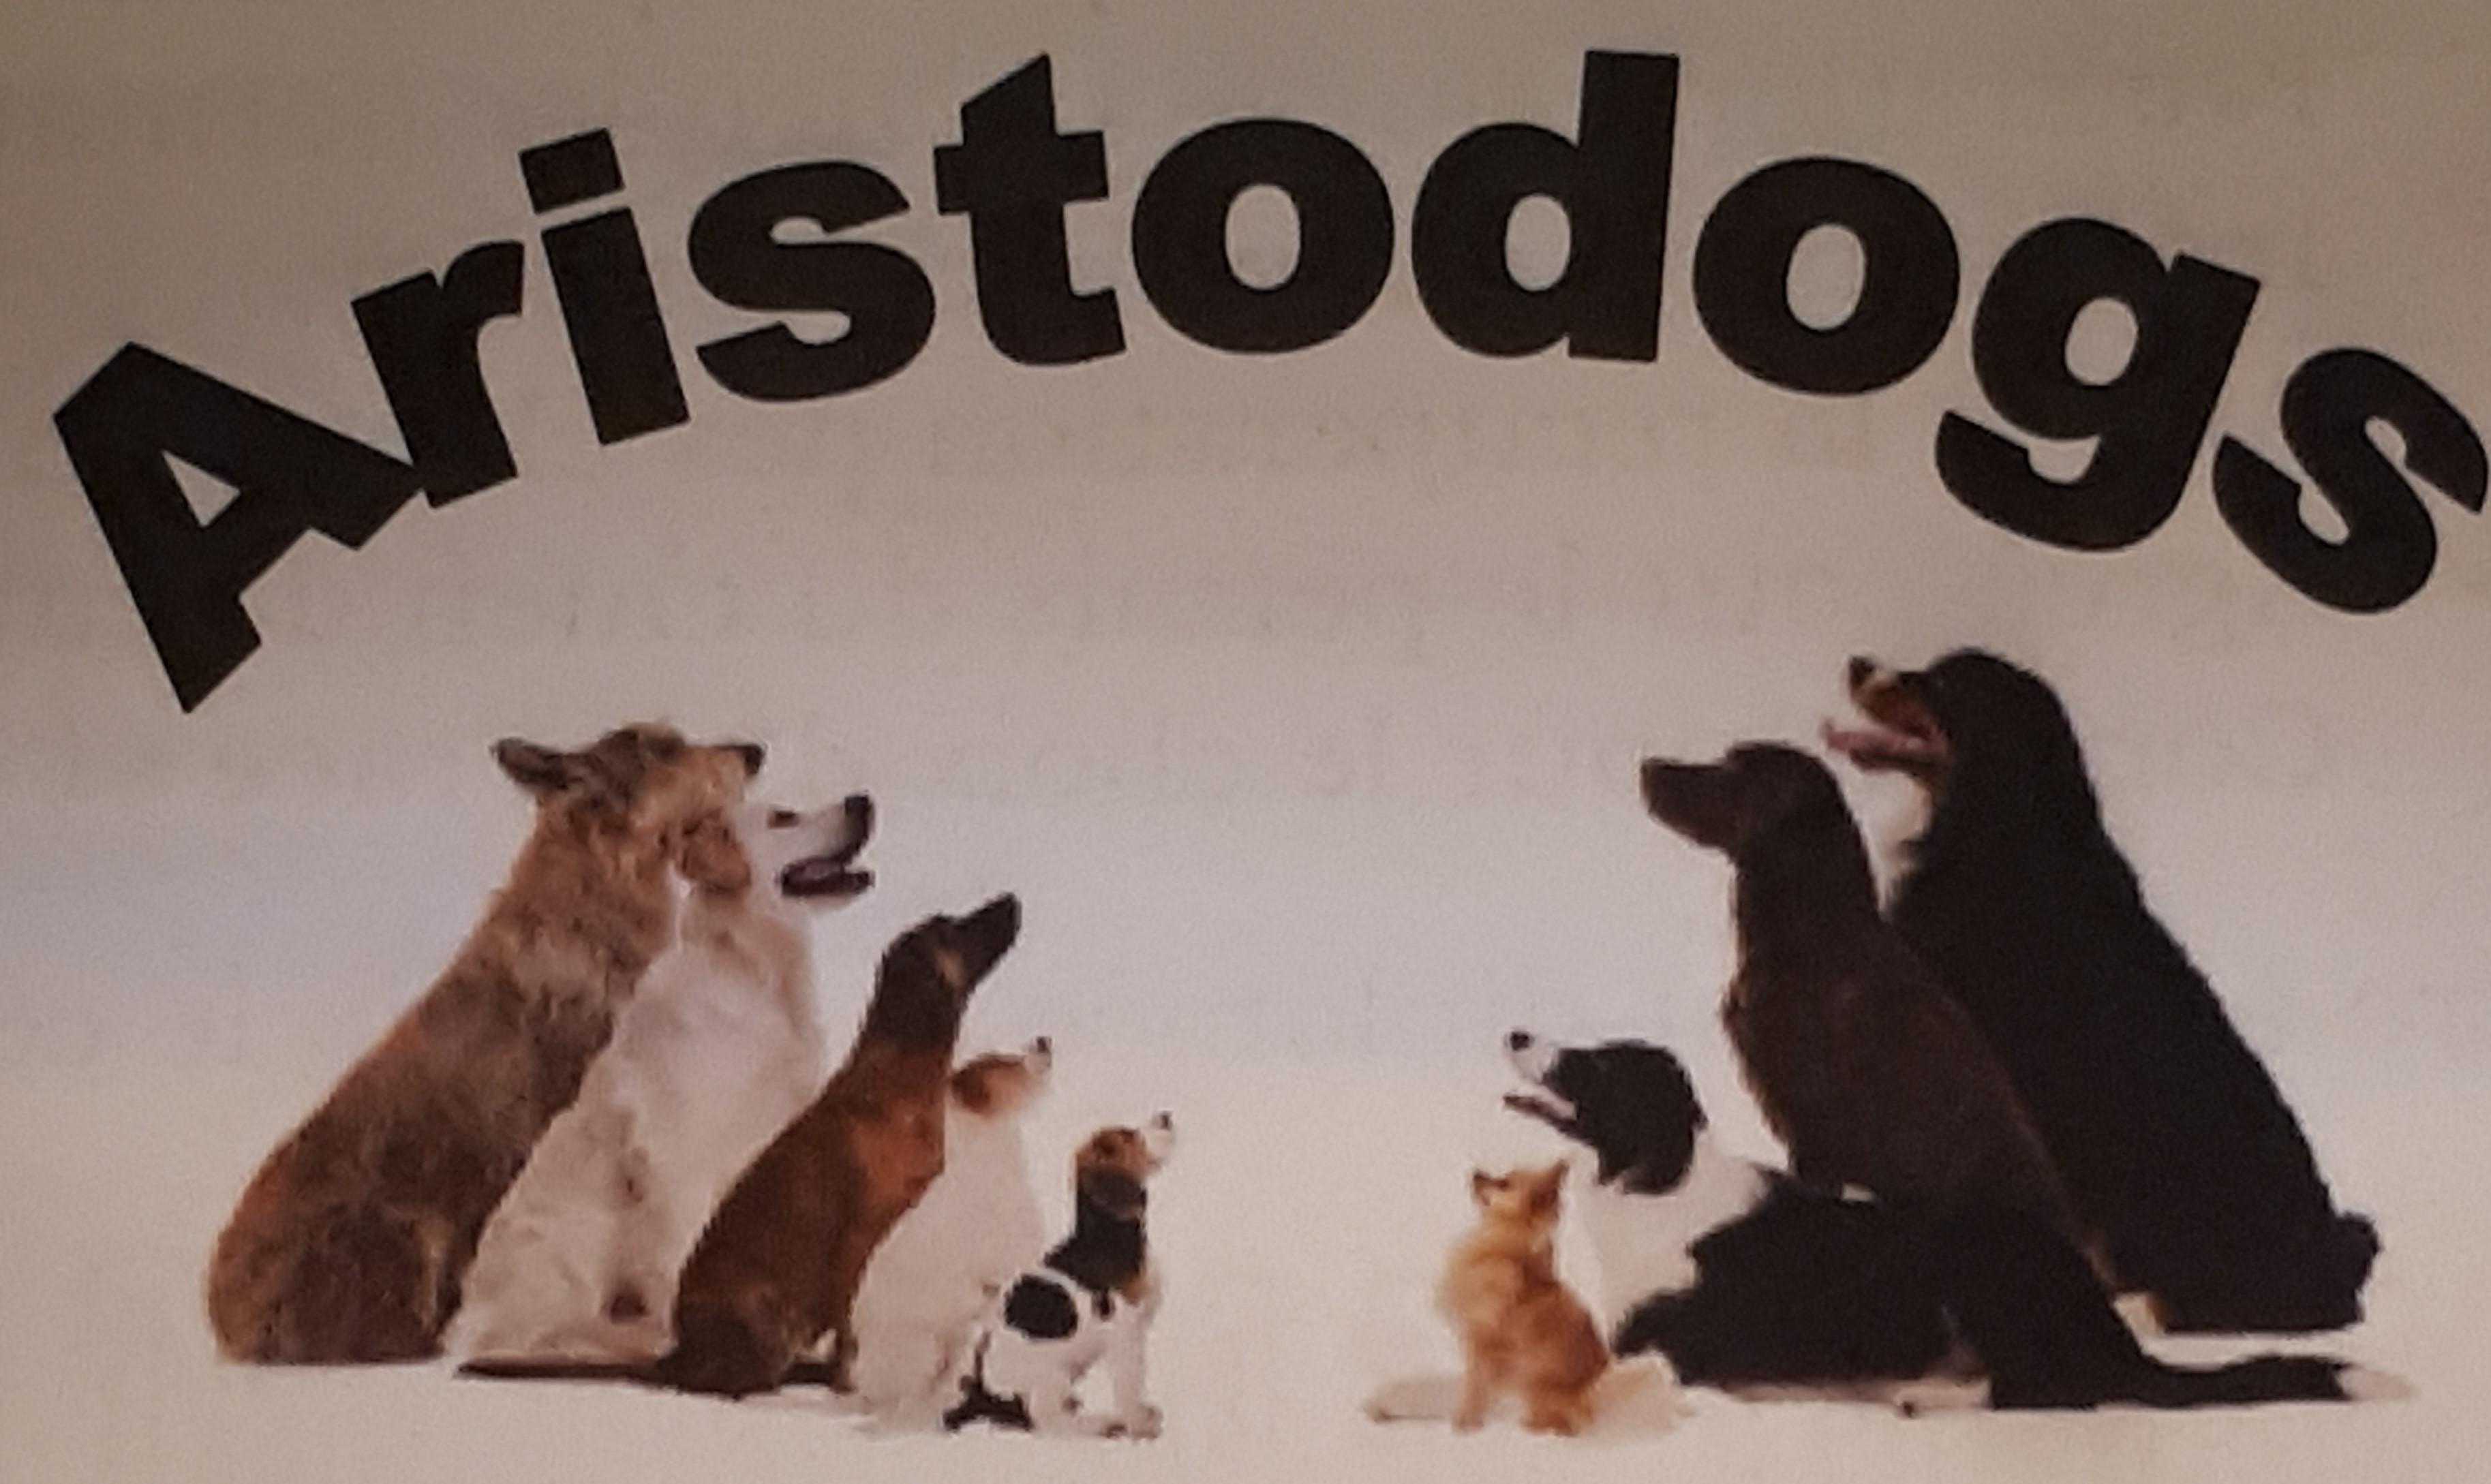 Aristodogs dressage animal